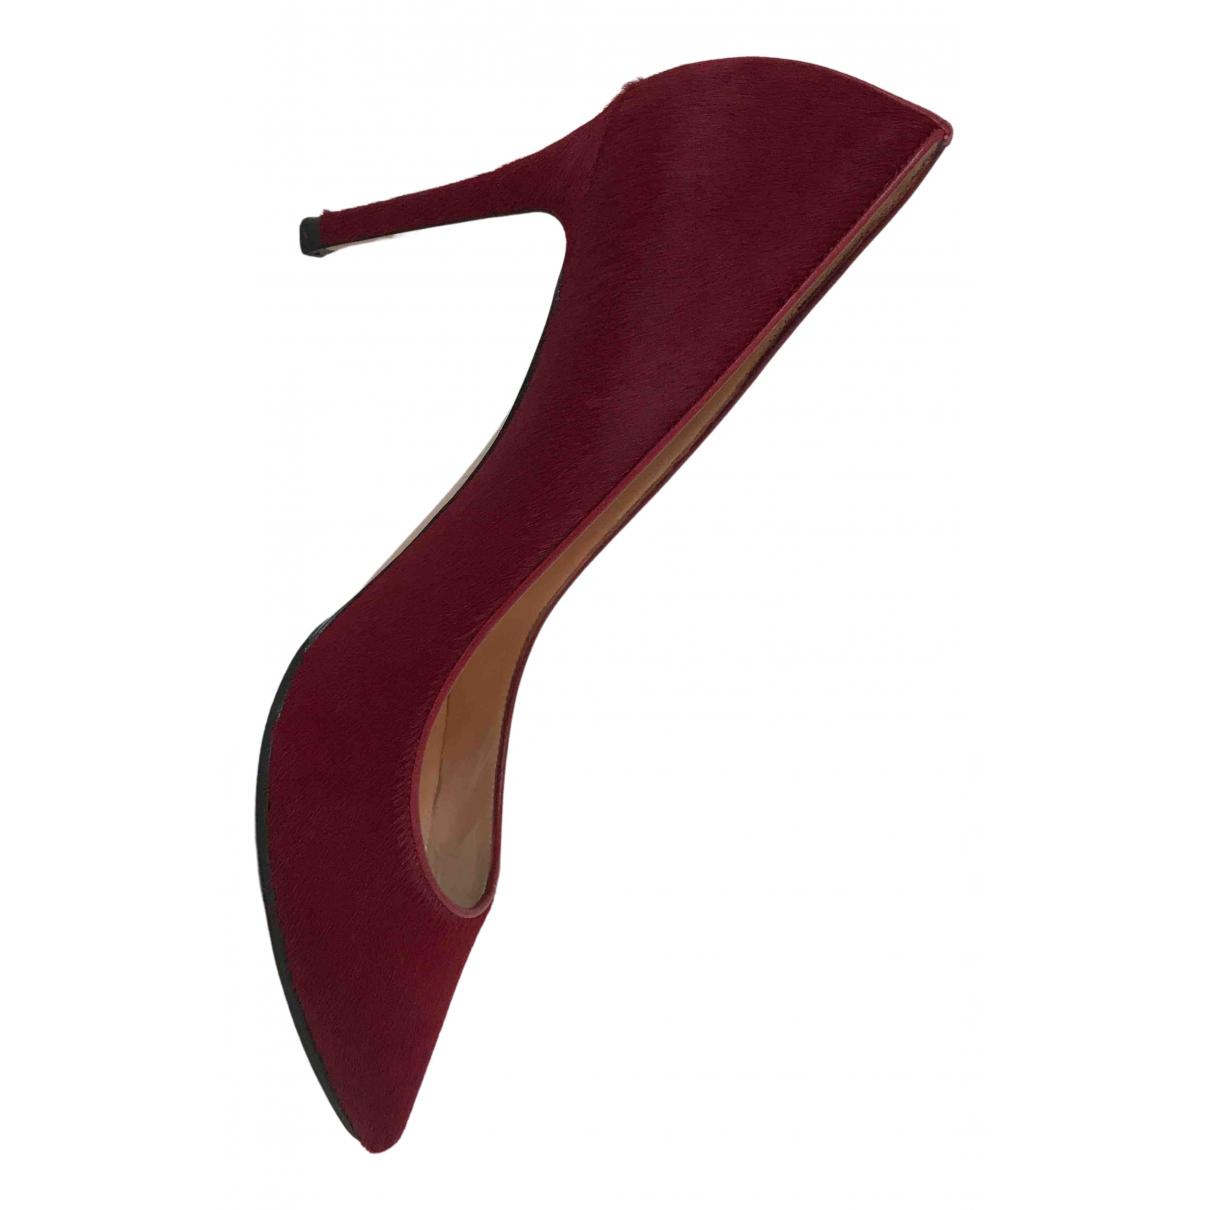 Gianvito Rossi Gianvito Red Pony-style calfskin Heels for Women 40.5 EU